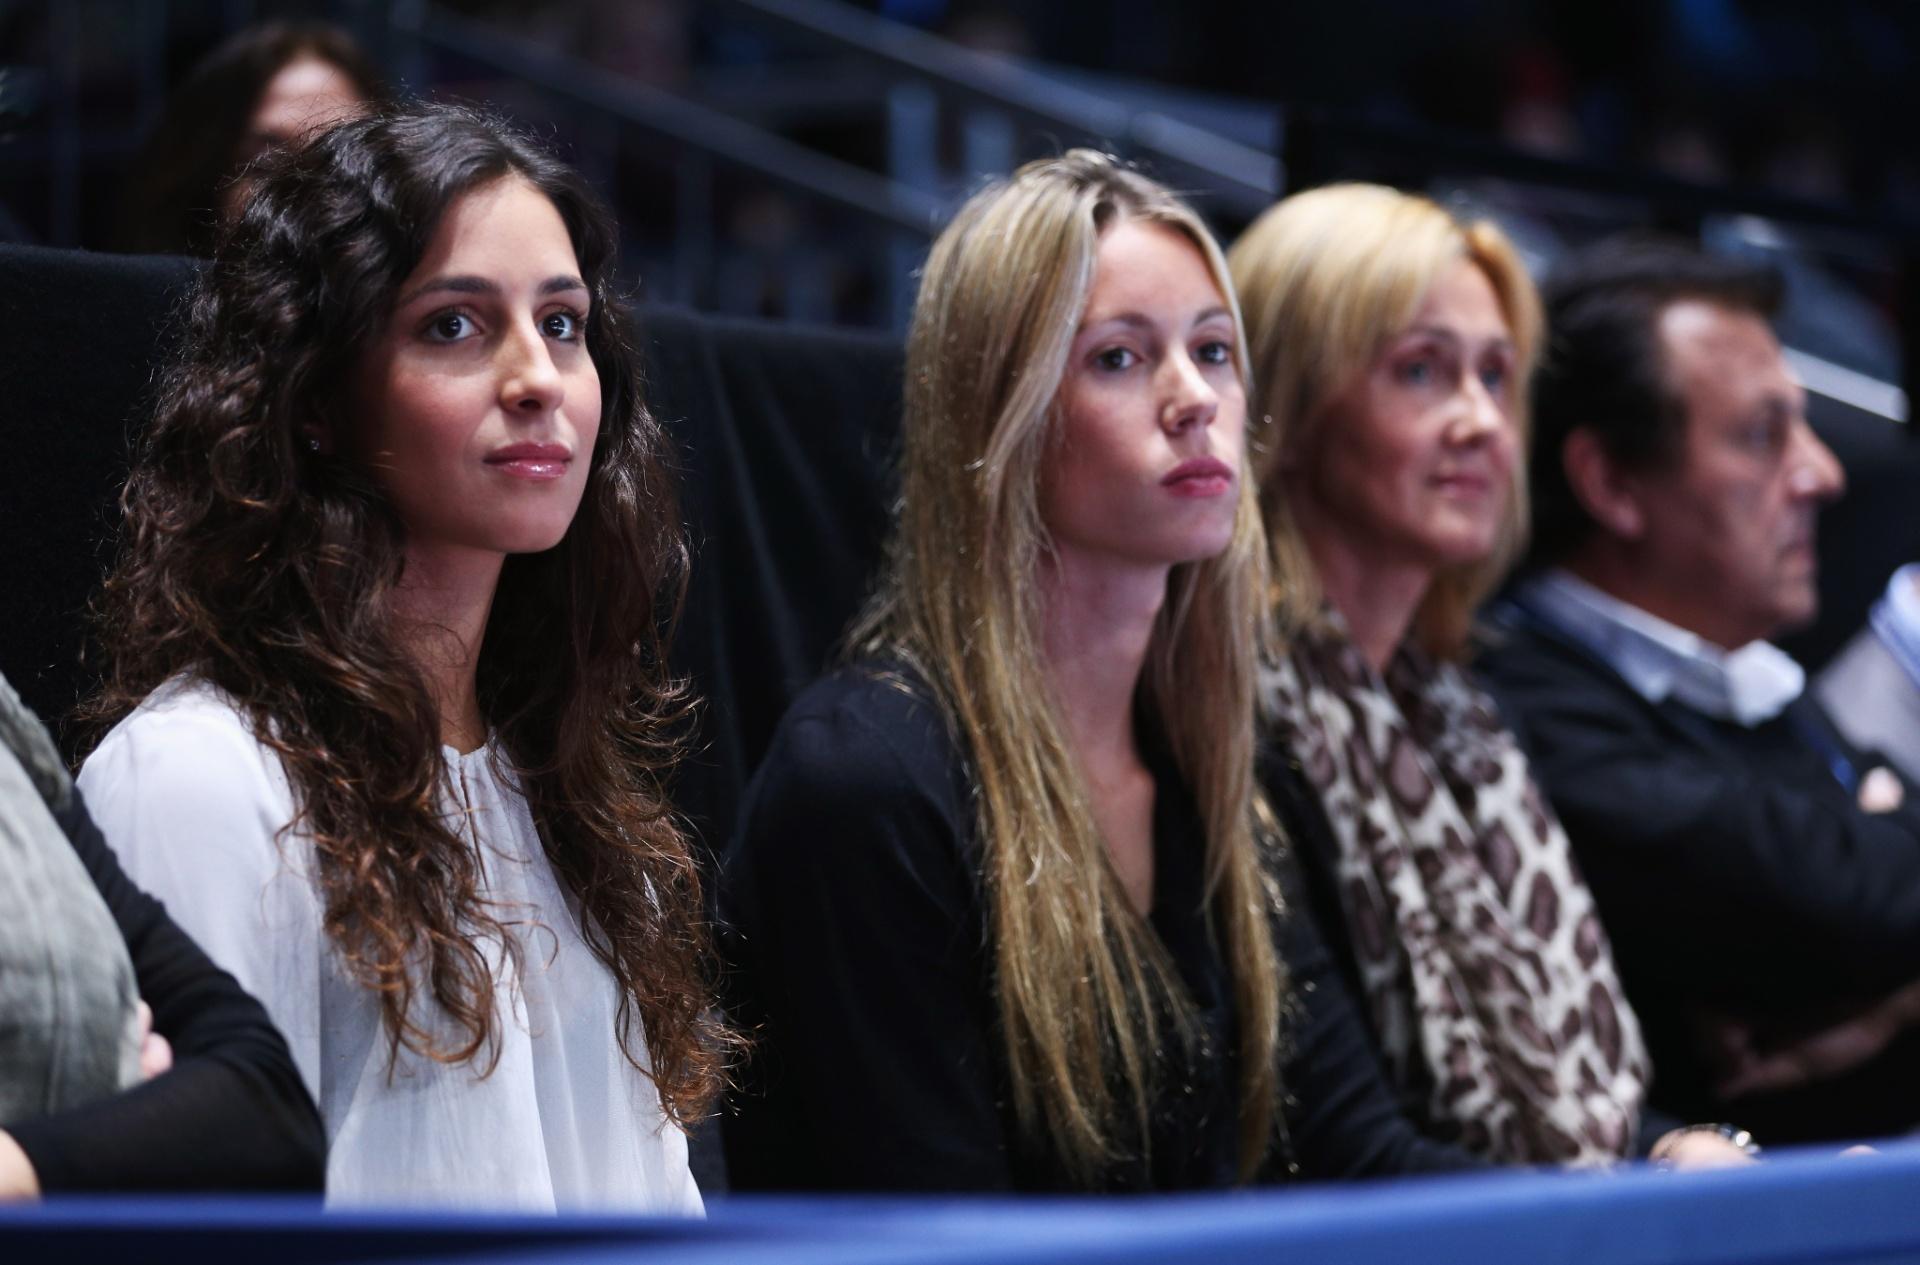 Fotos: Maria Isabel Nadal, irmã do tenista Rafael Nadal ...